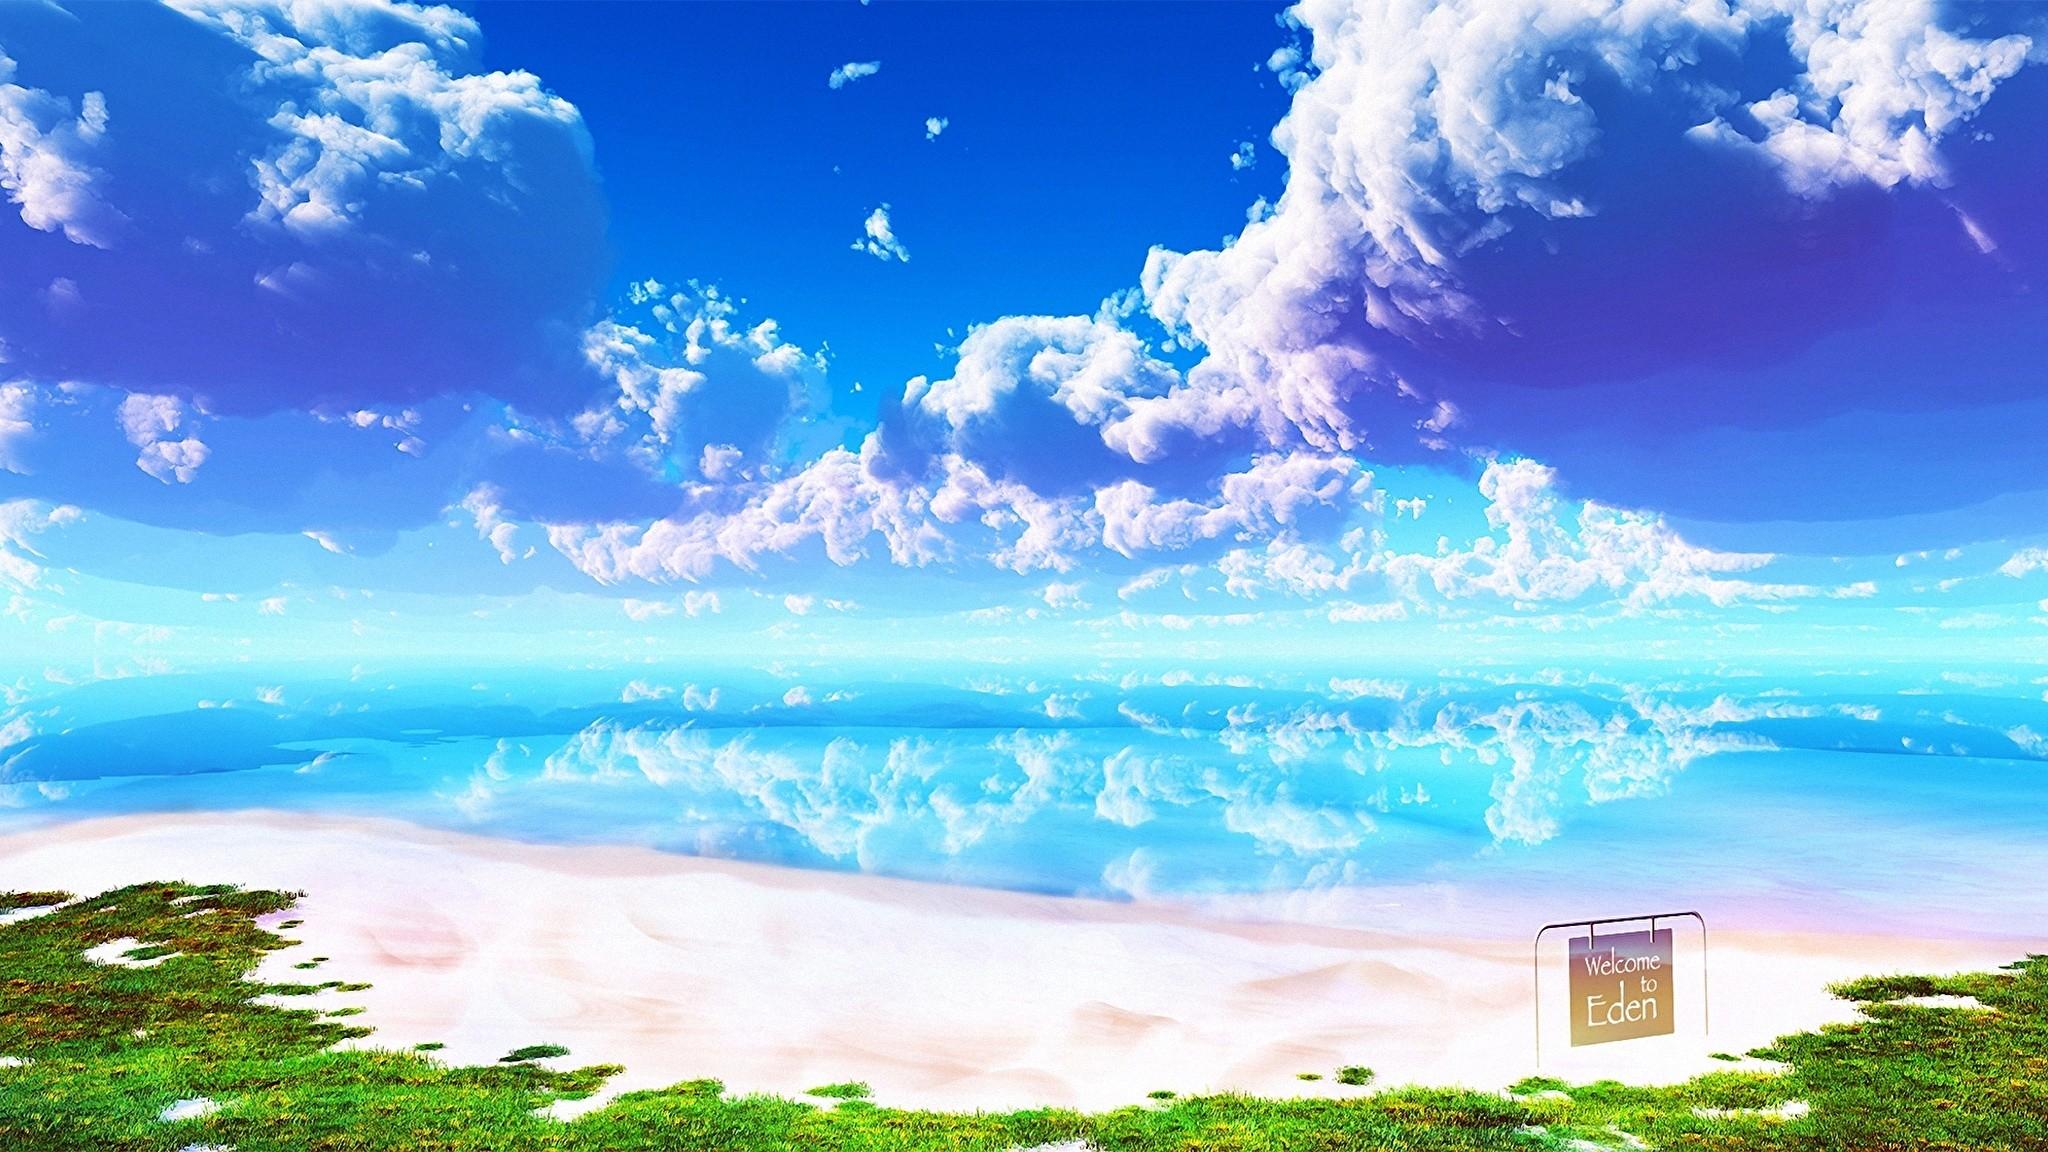 Anime Cloud hd wallpaper download